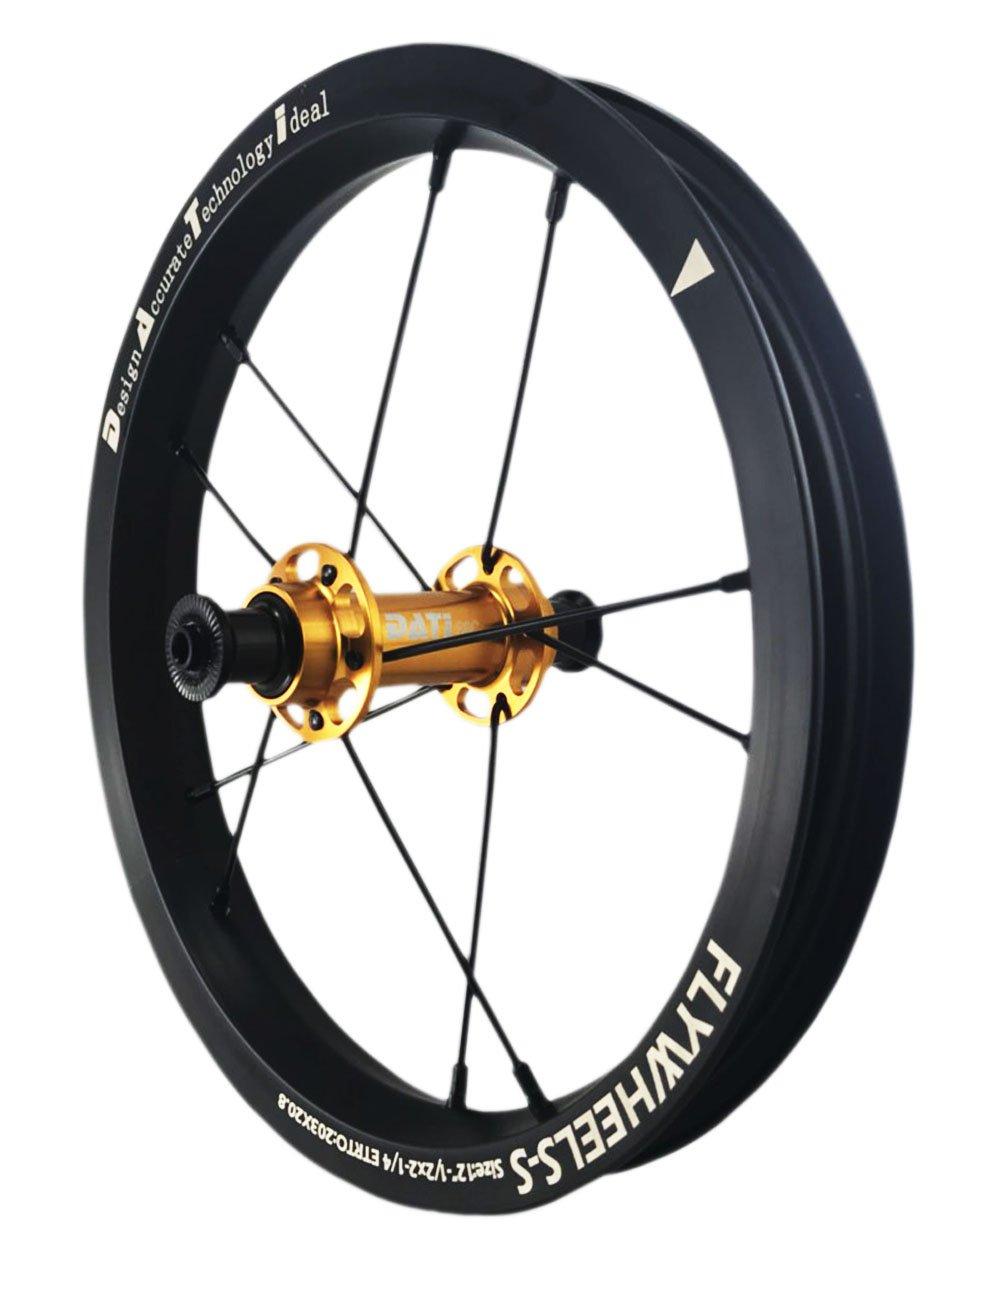 DATI 12インチ S6C-W Alloy バランスバイク Kids Balance Bike Bicycle Super light 子供自転車ホイール B07BM2G8H8 90x10MM for Bixbi Puky|オレンジ オレンジ 90x10MM for Bixbi Puky